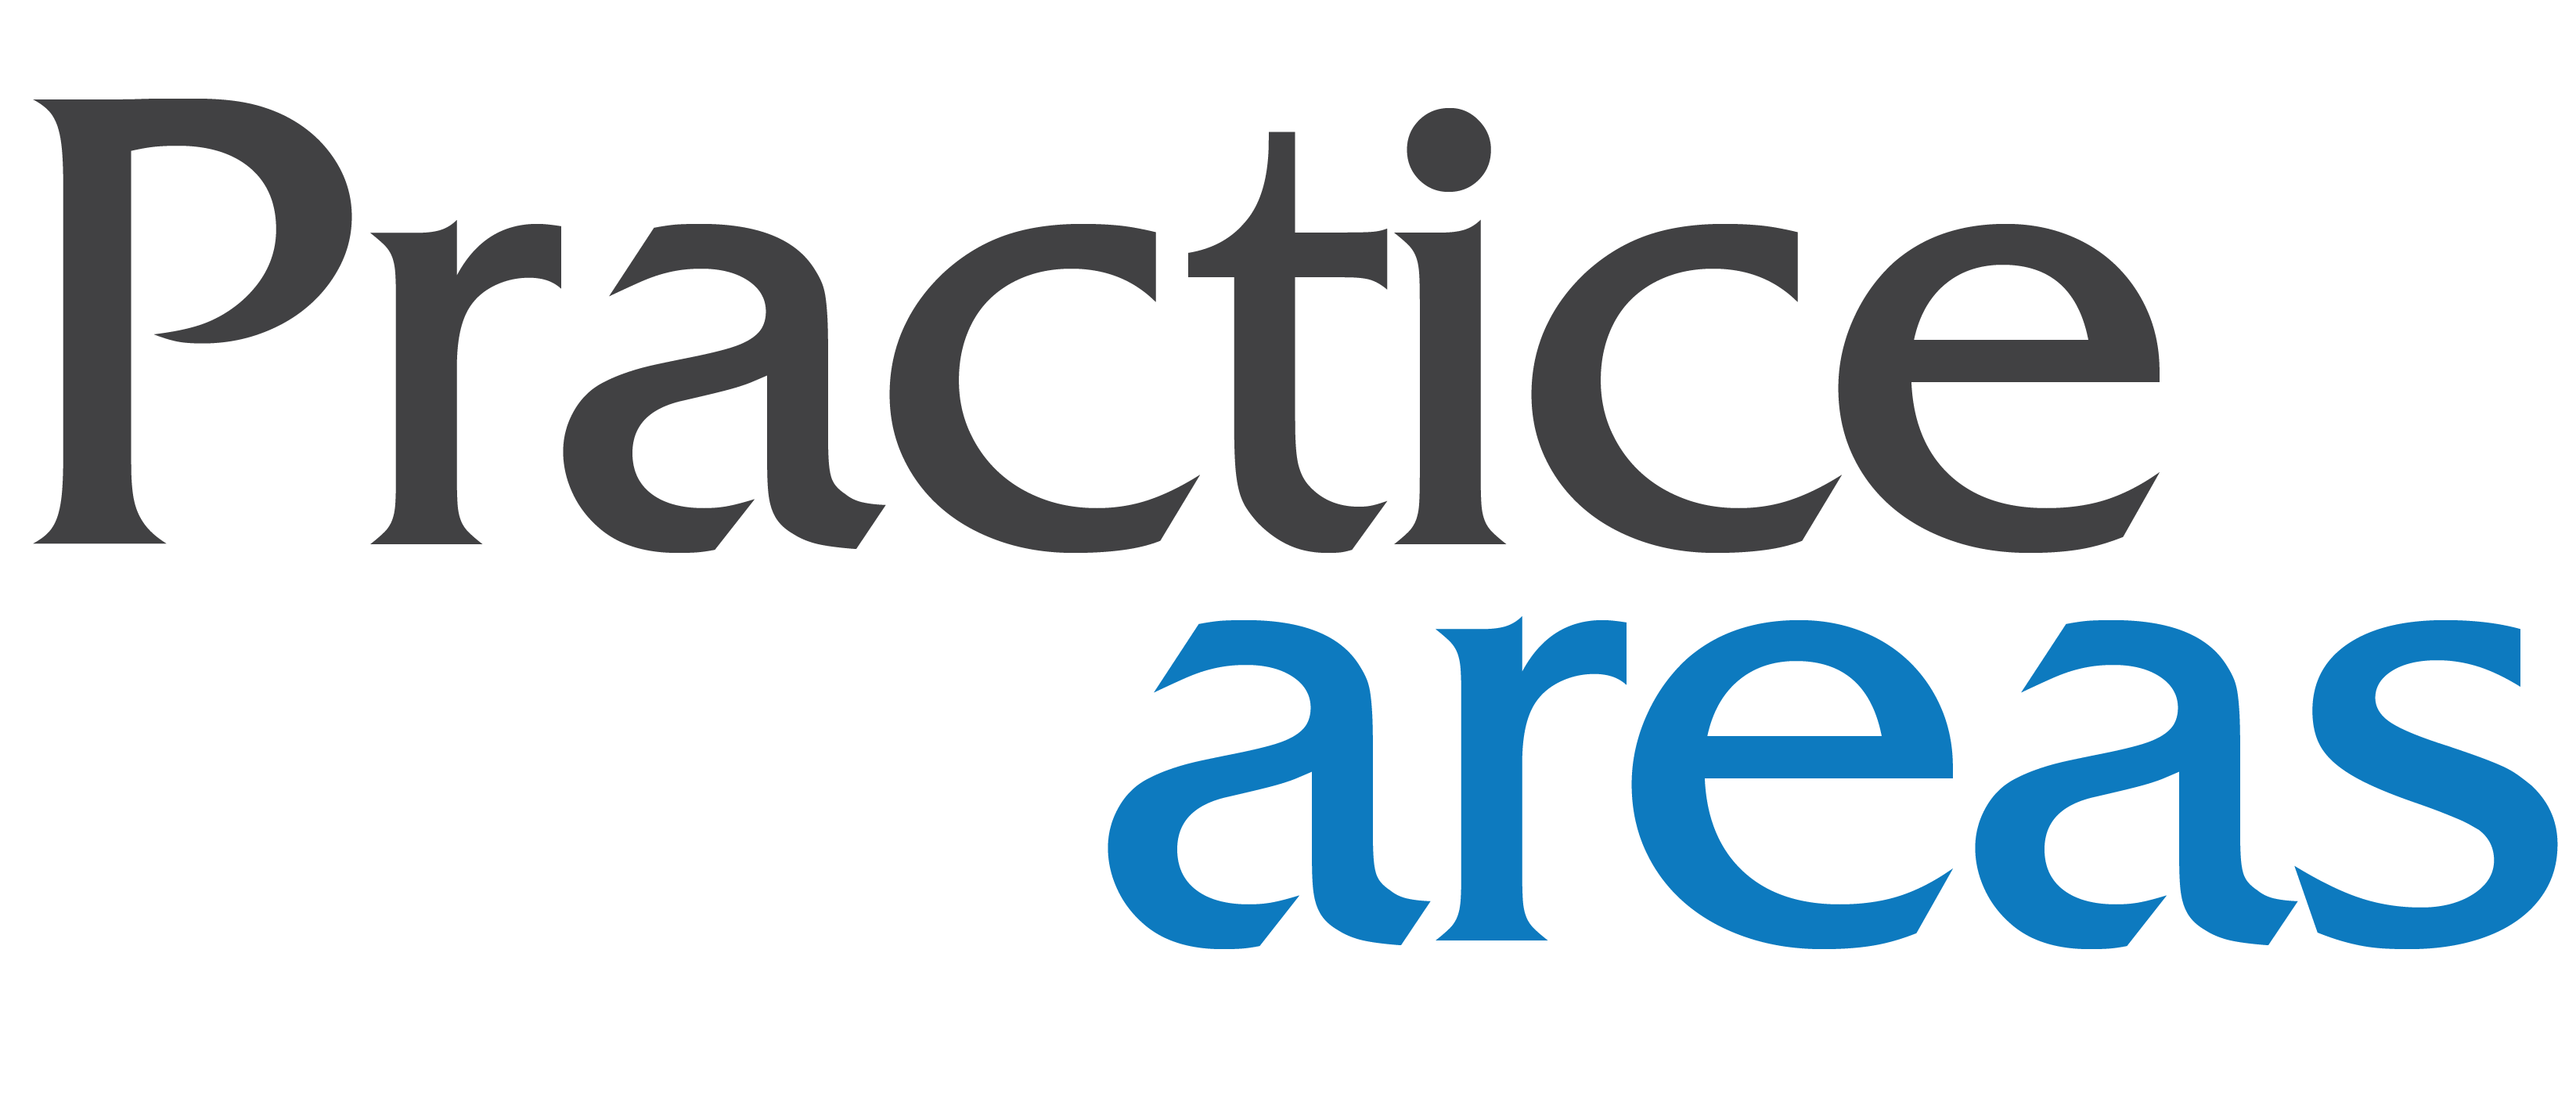 singular executive search practice areas headline